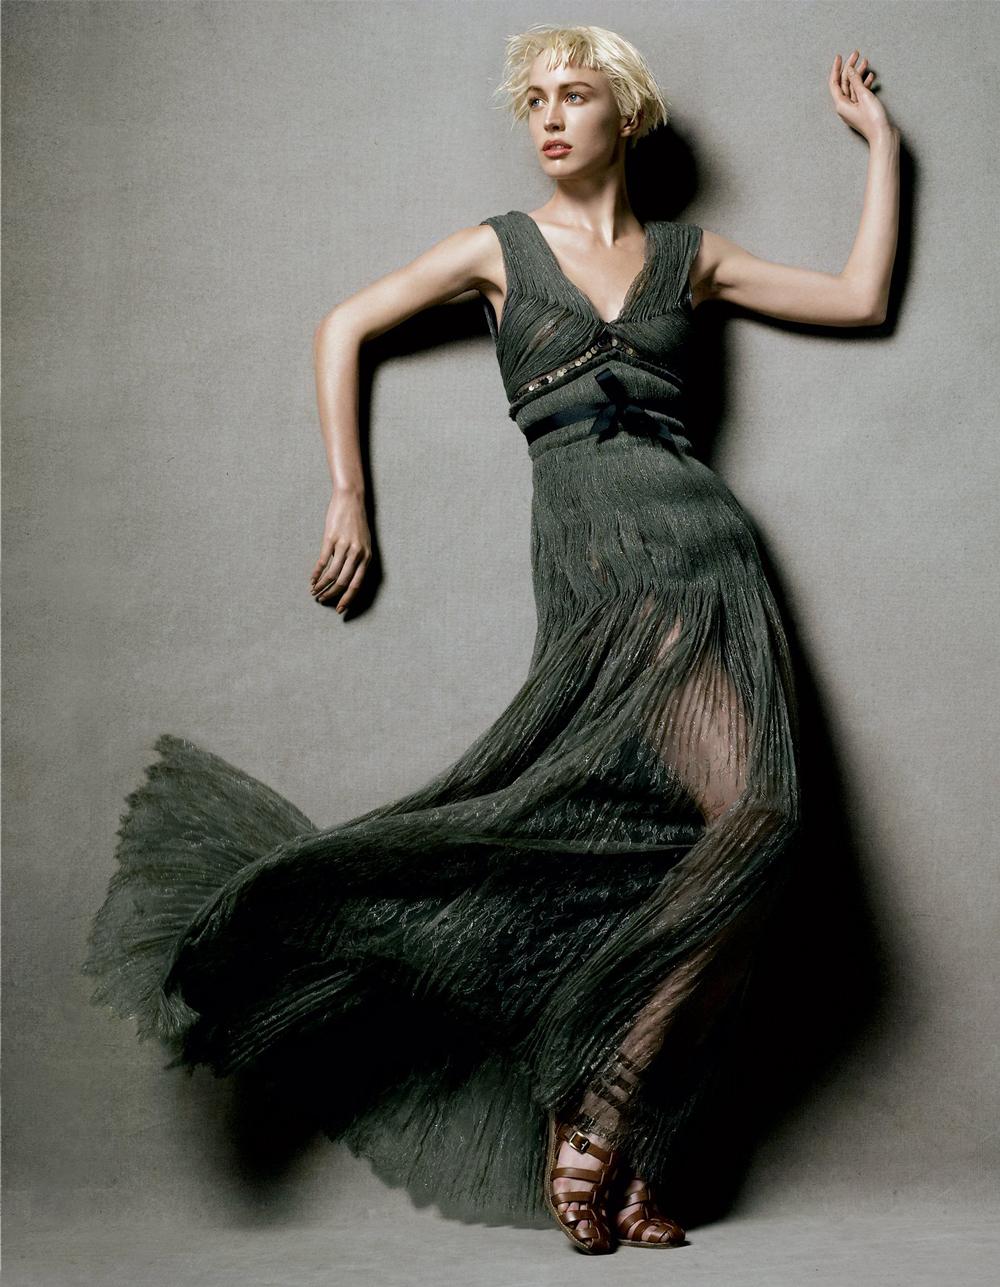 Raquel Zimmermann in Lanvin by Alber Elbaz in Vogue US December 2004 (photography: Steven Meisel) via www.fashionedbylove.co.uk